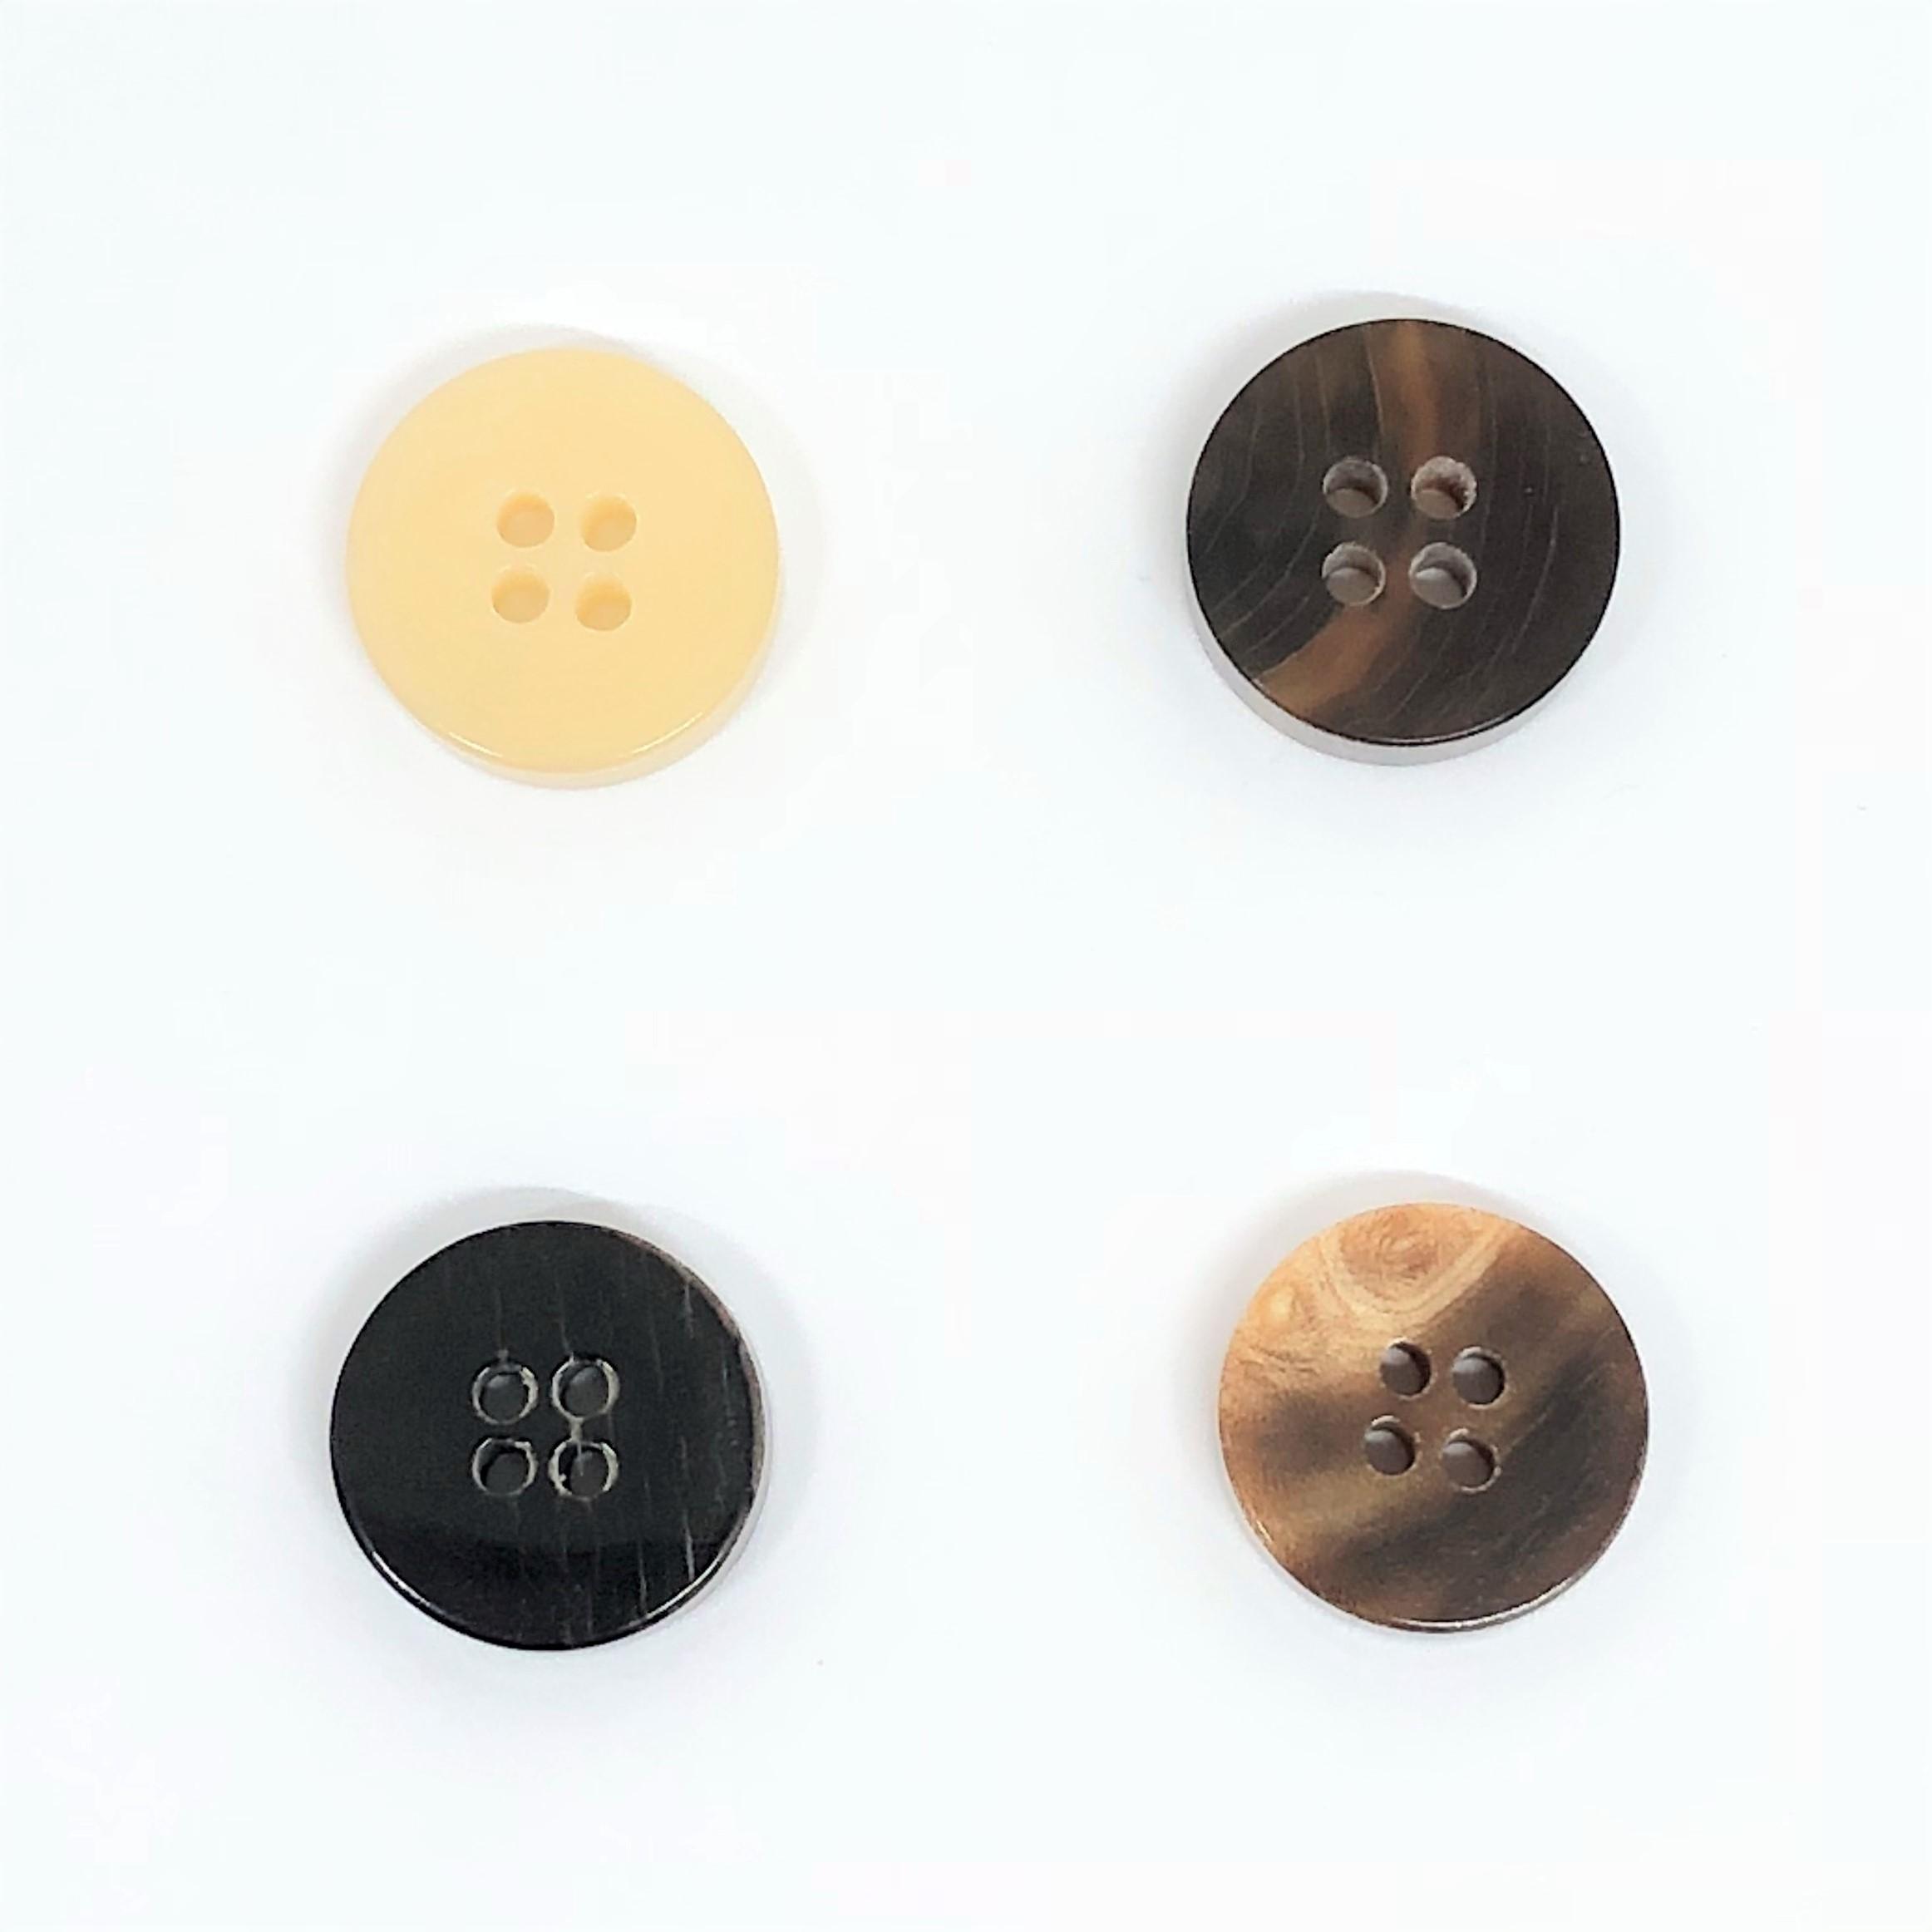 TGH1007 オリジナル水牛四つ穴ボタン オークラ商事 - ApparelX アパレル資材卸通販